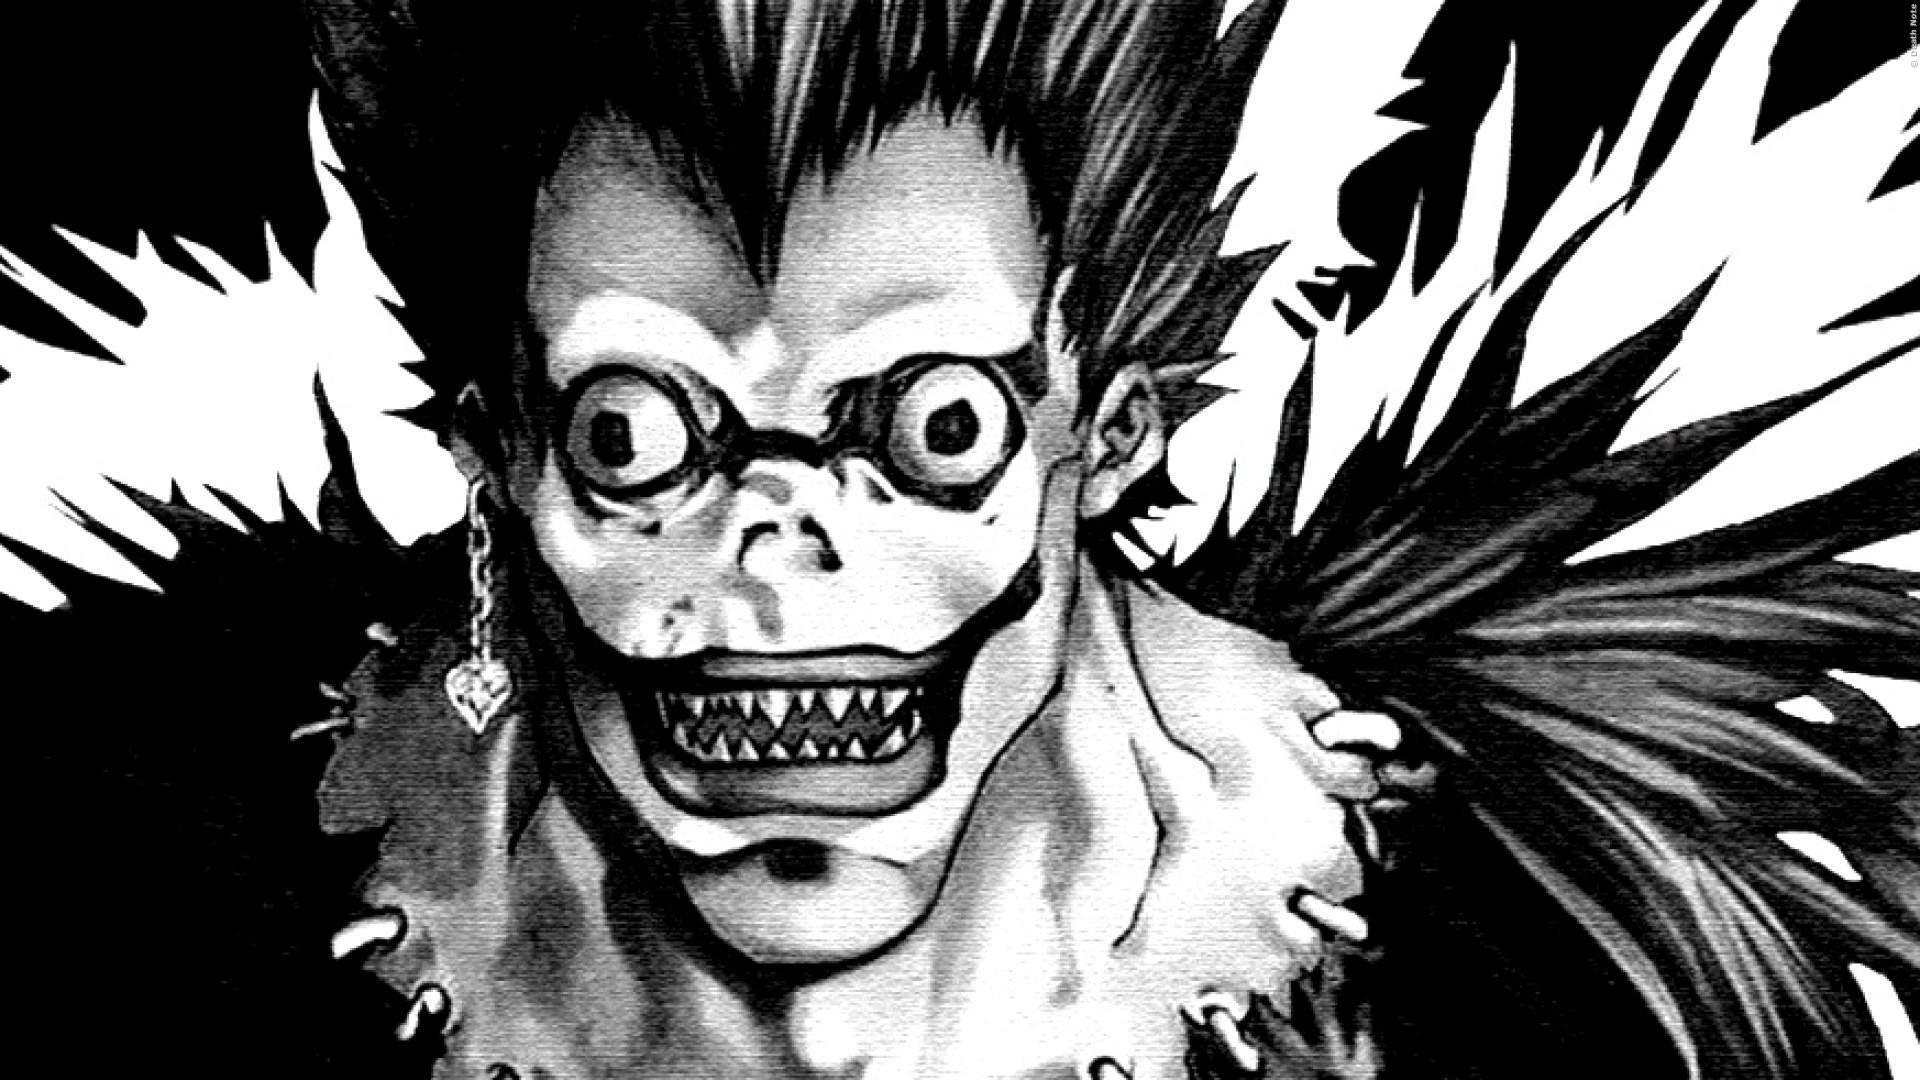 Animé und Manga by FILM.TV cover image